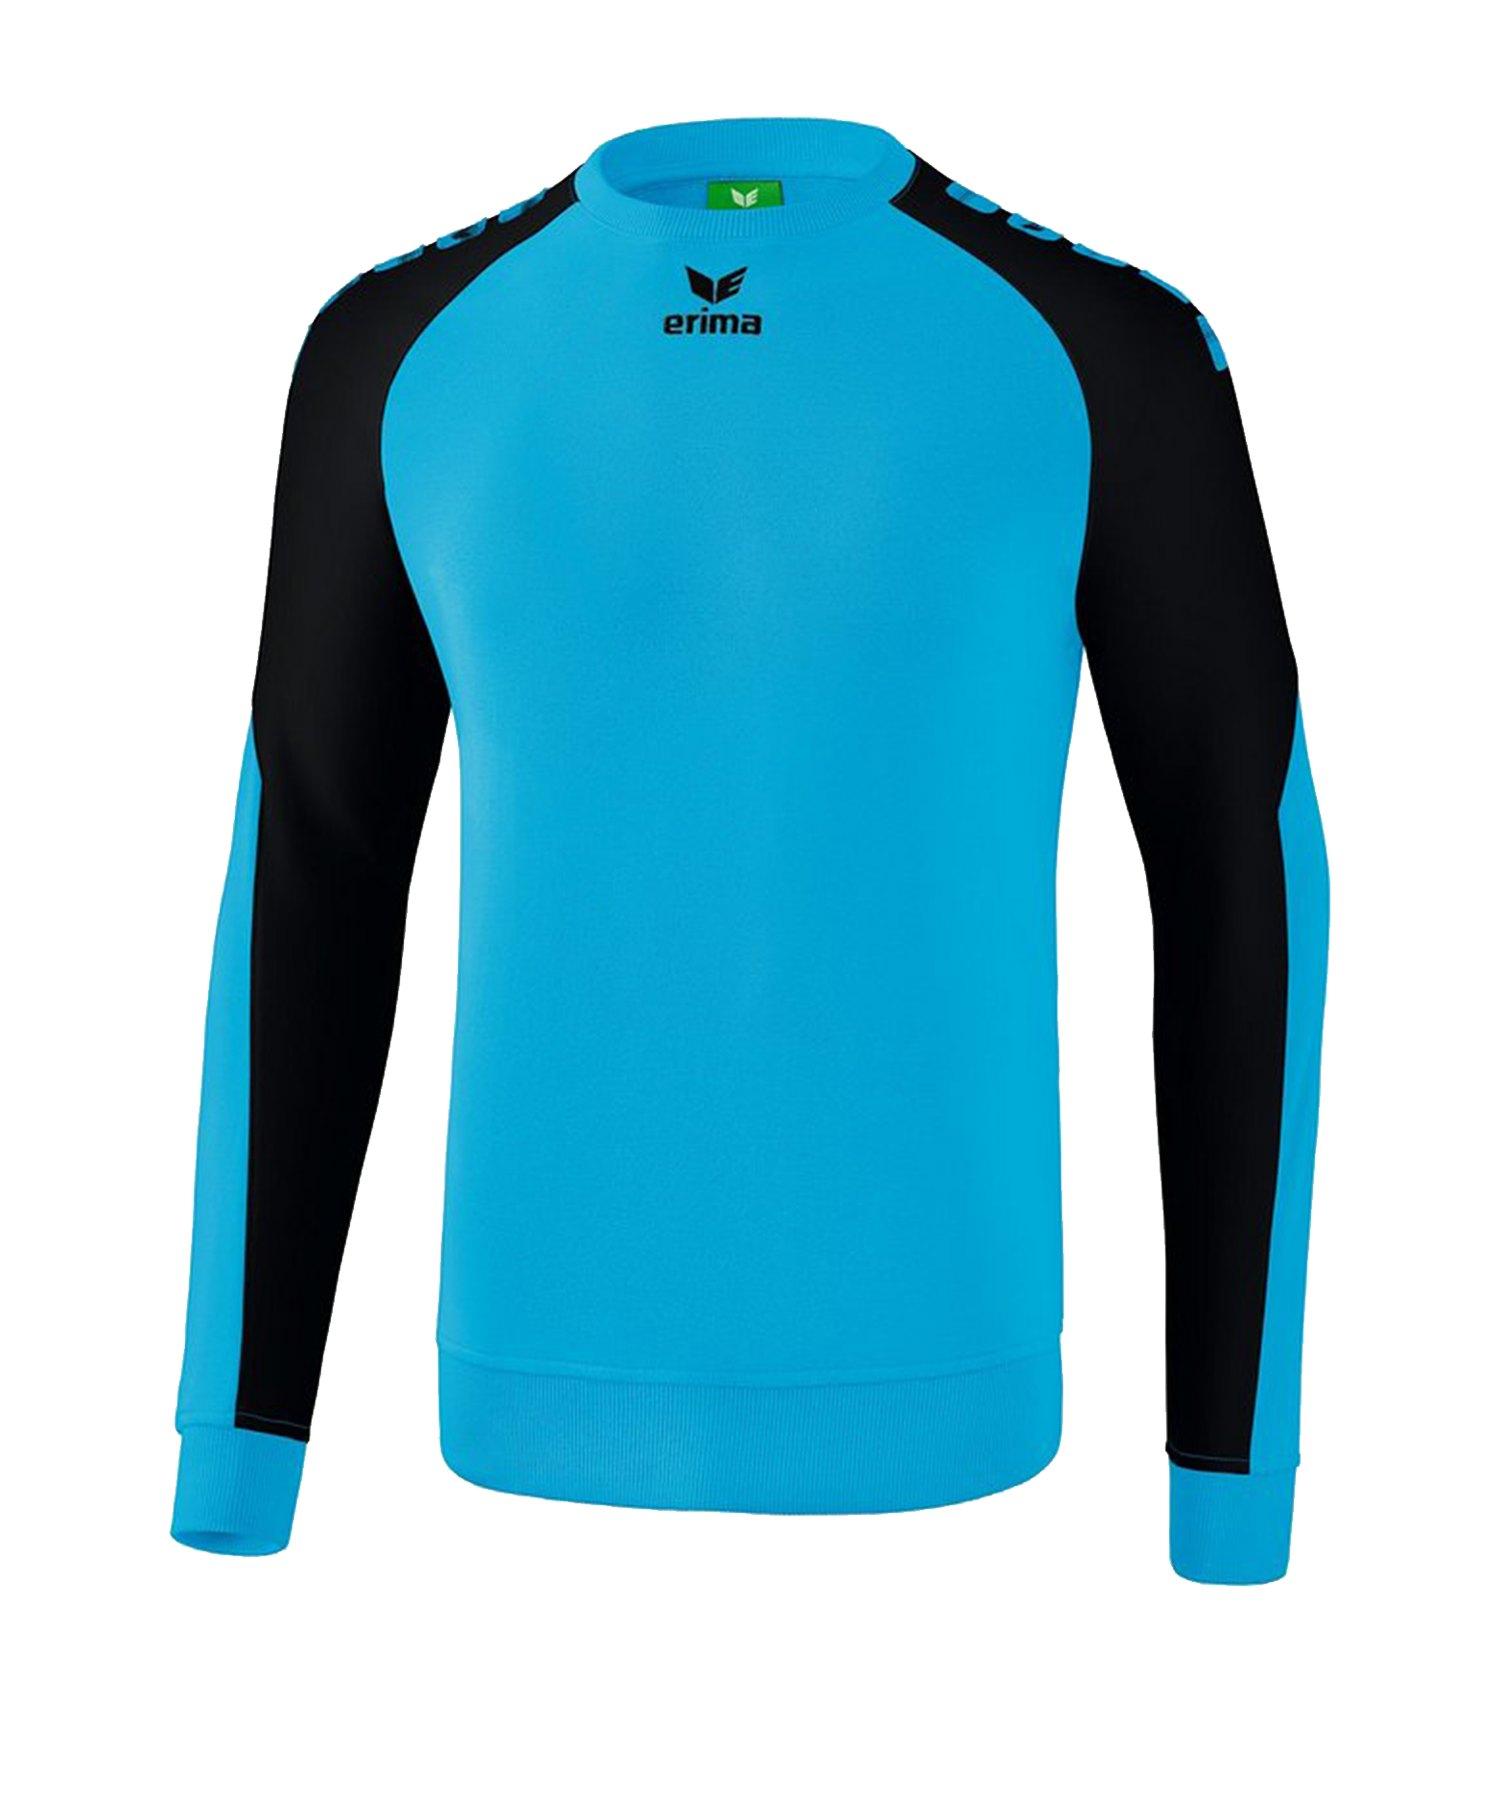 Erima Essential 5-C Sweatshirt Blau Schwarz - Blau